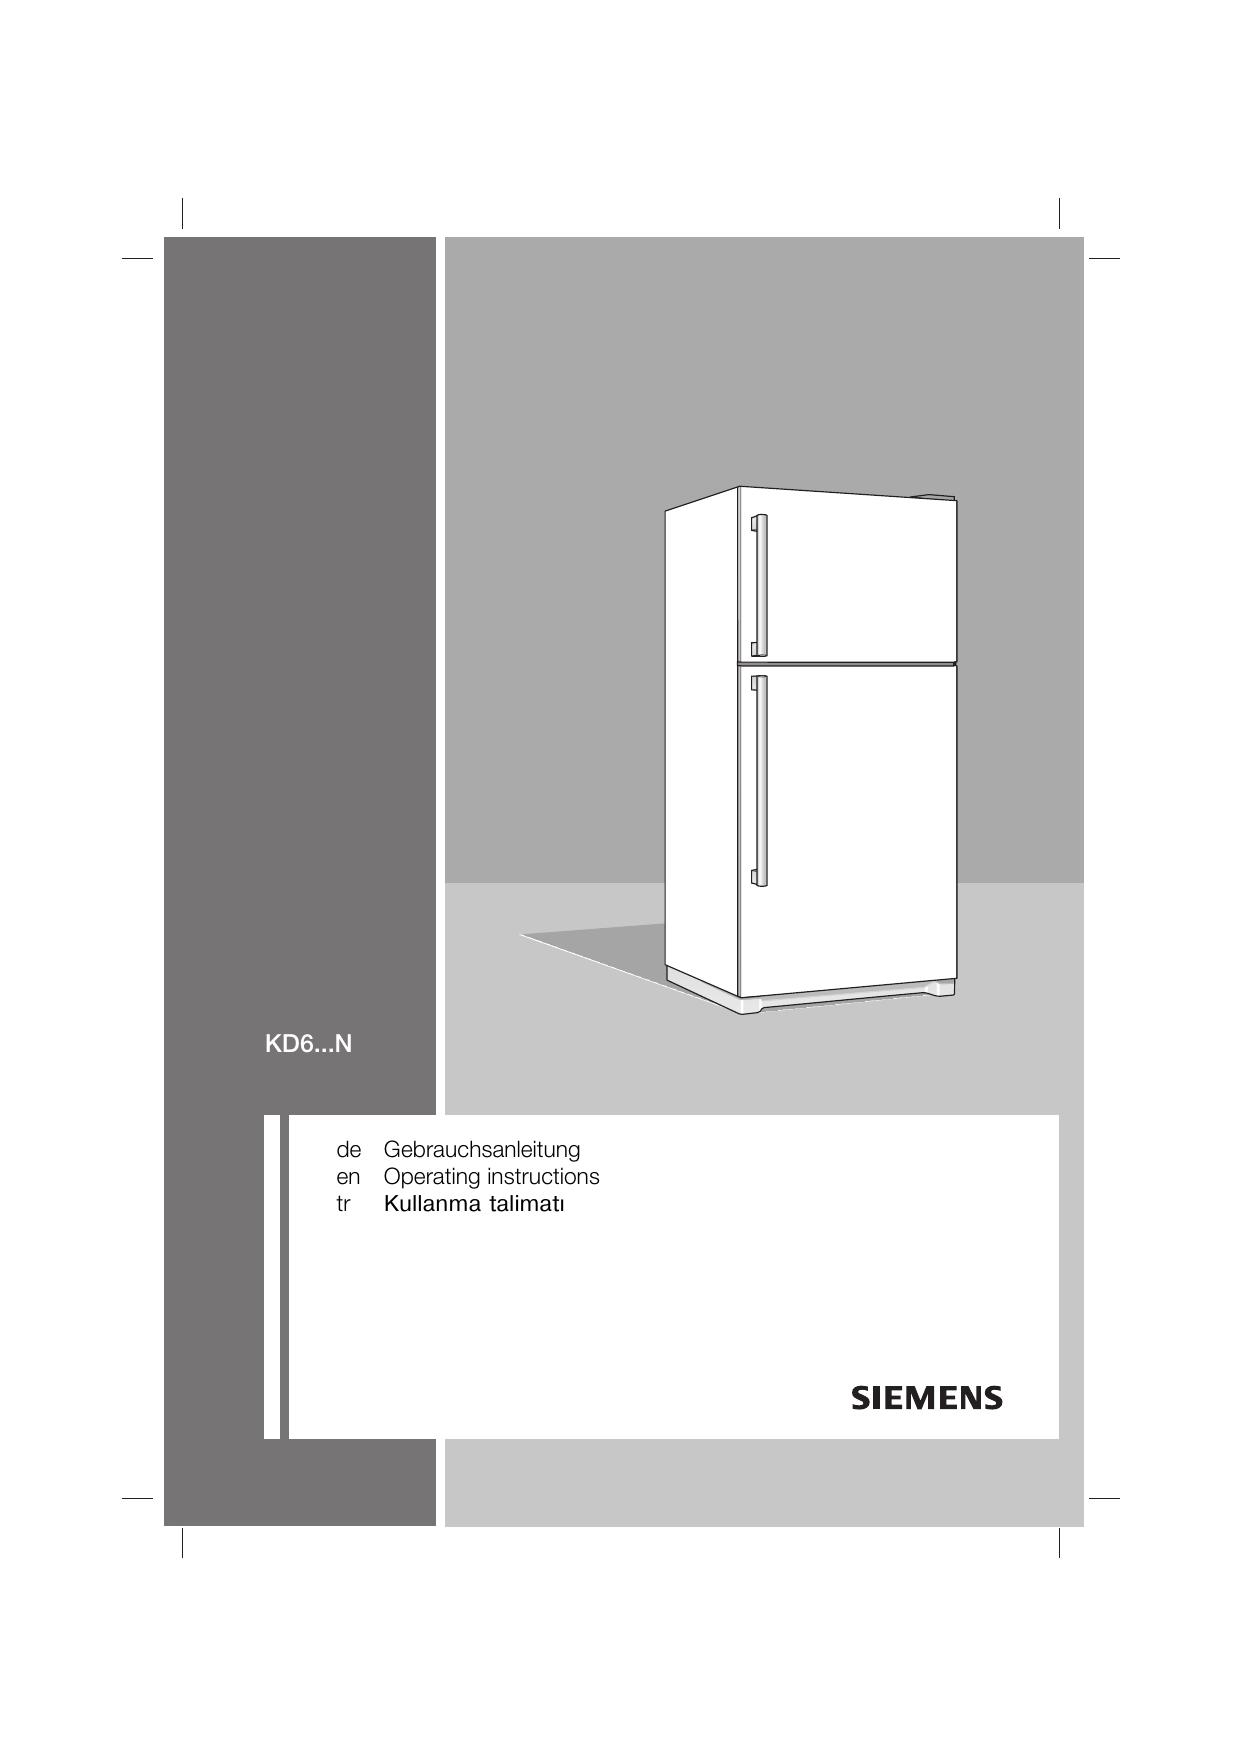 Siemens Refrigerator Solo Instruction Manual Manualzz